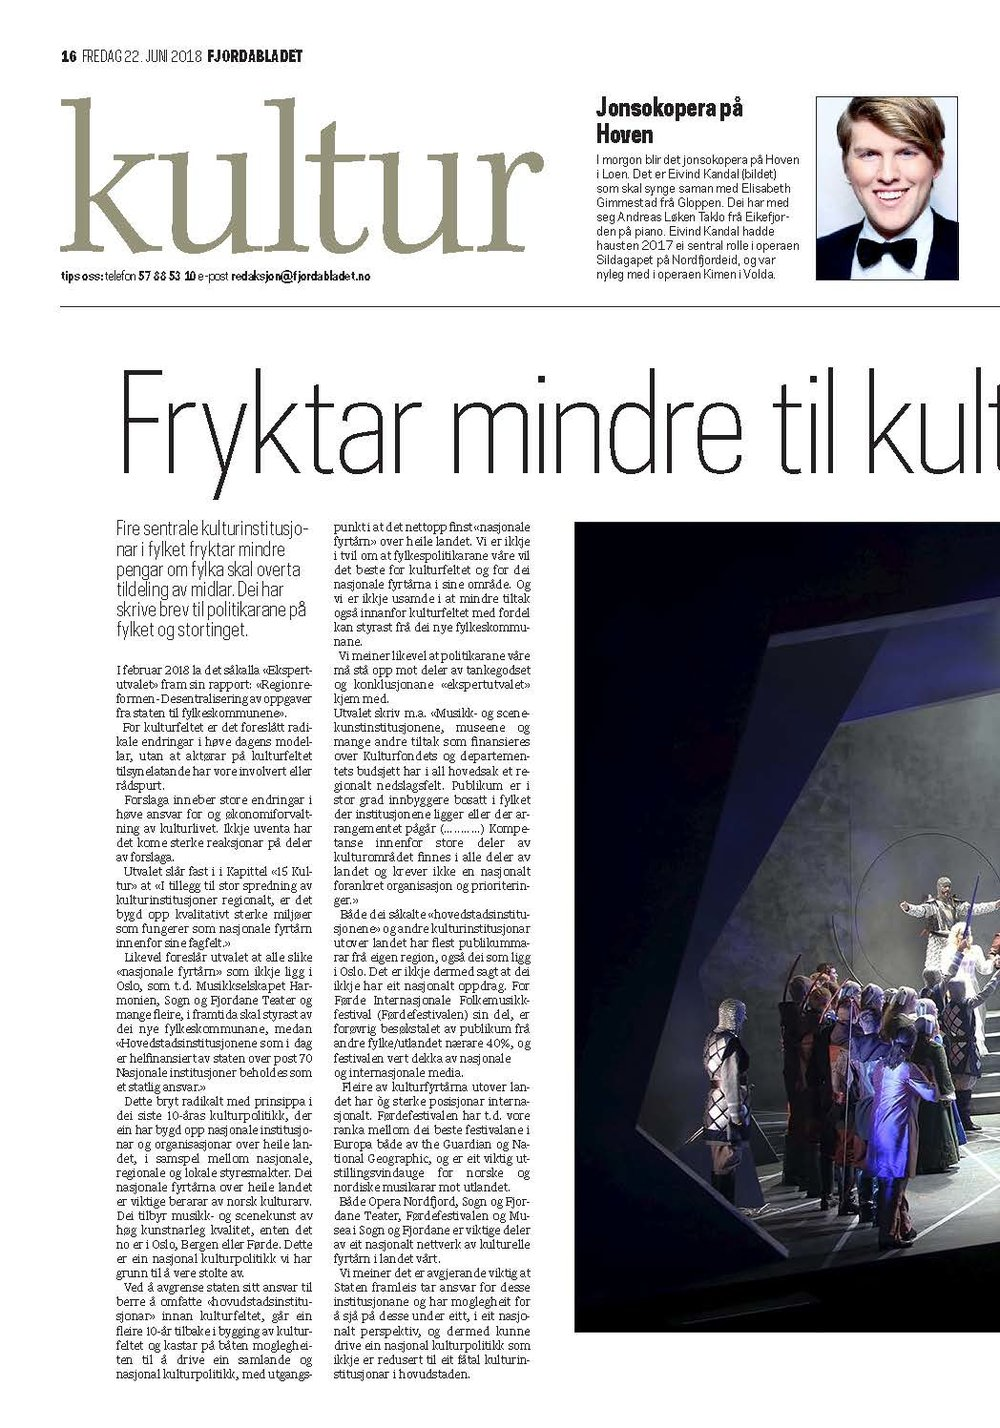 Fjordabladet-2018-06-22-side-16-Kulturmidlar.jpg